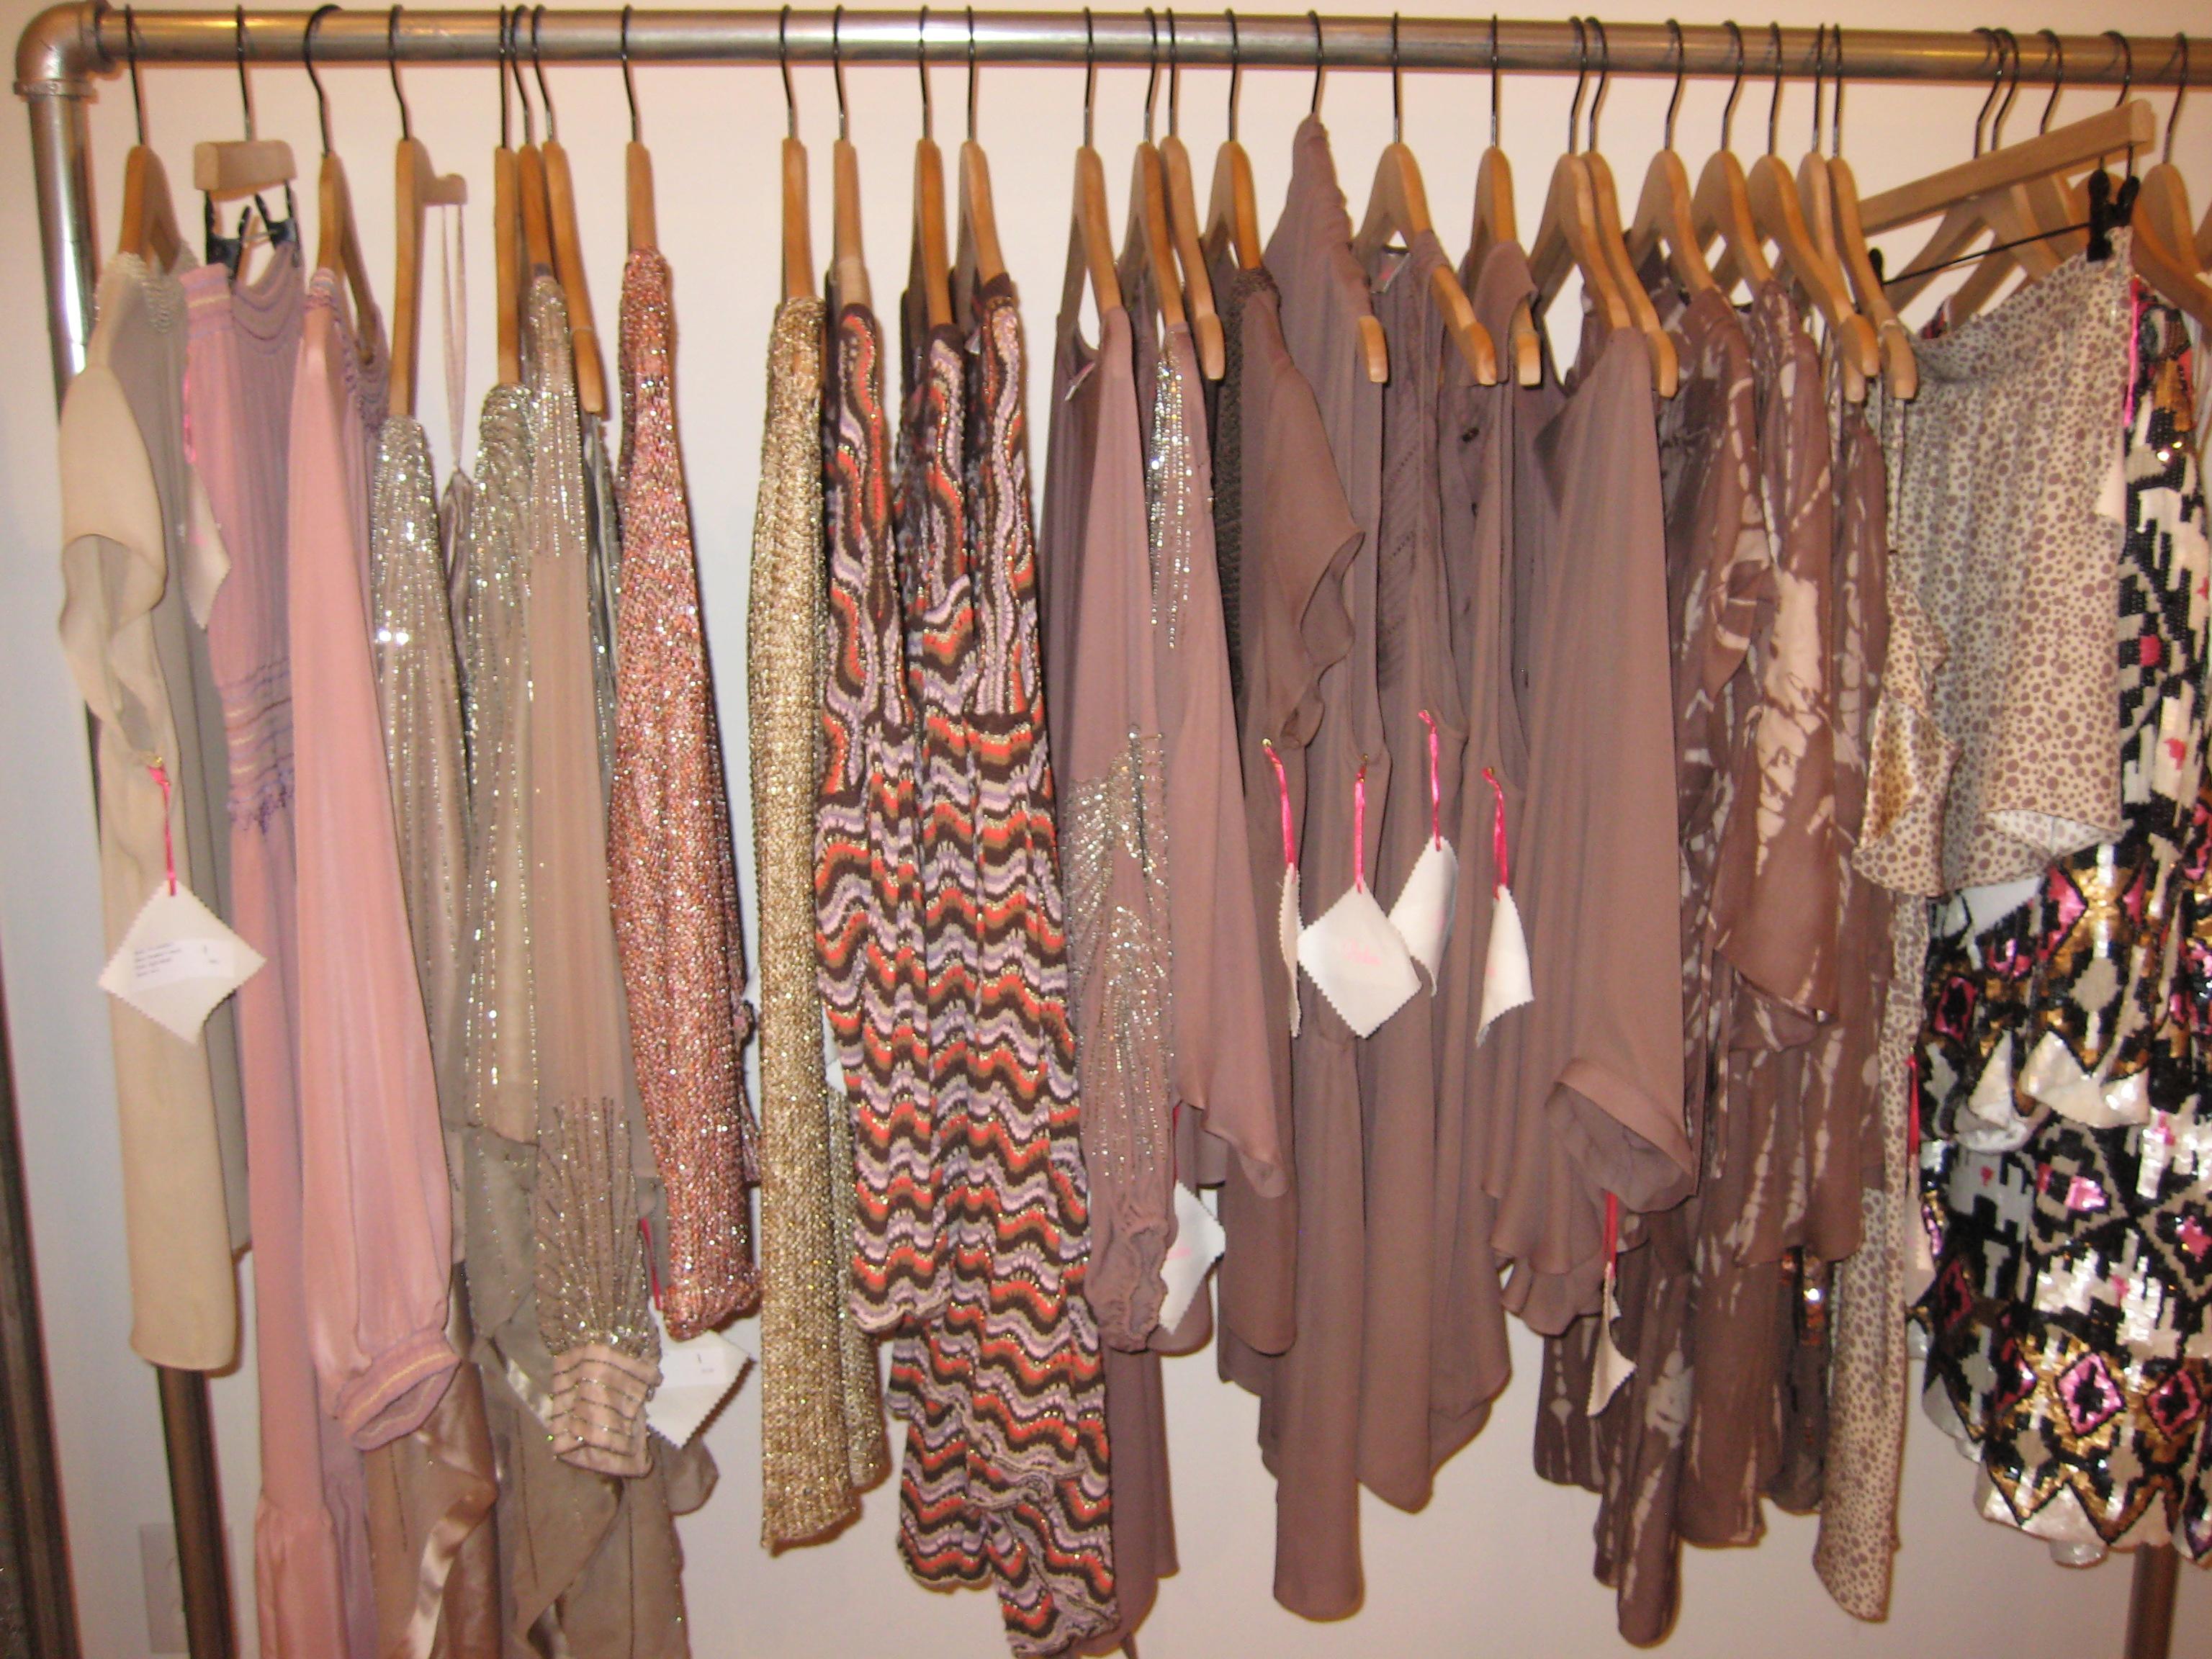 The Resort Collection - loving the soft desert hues